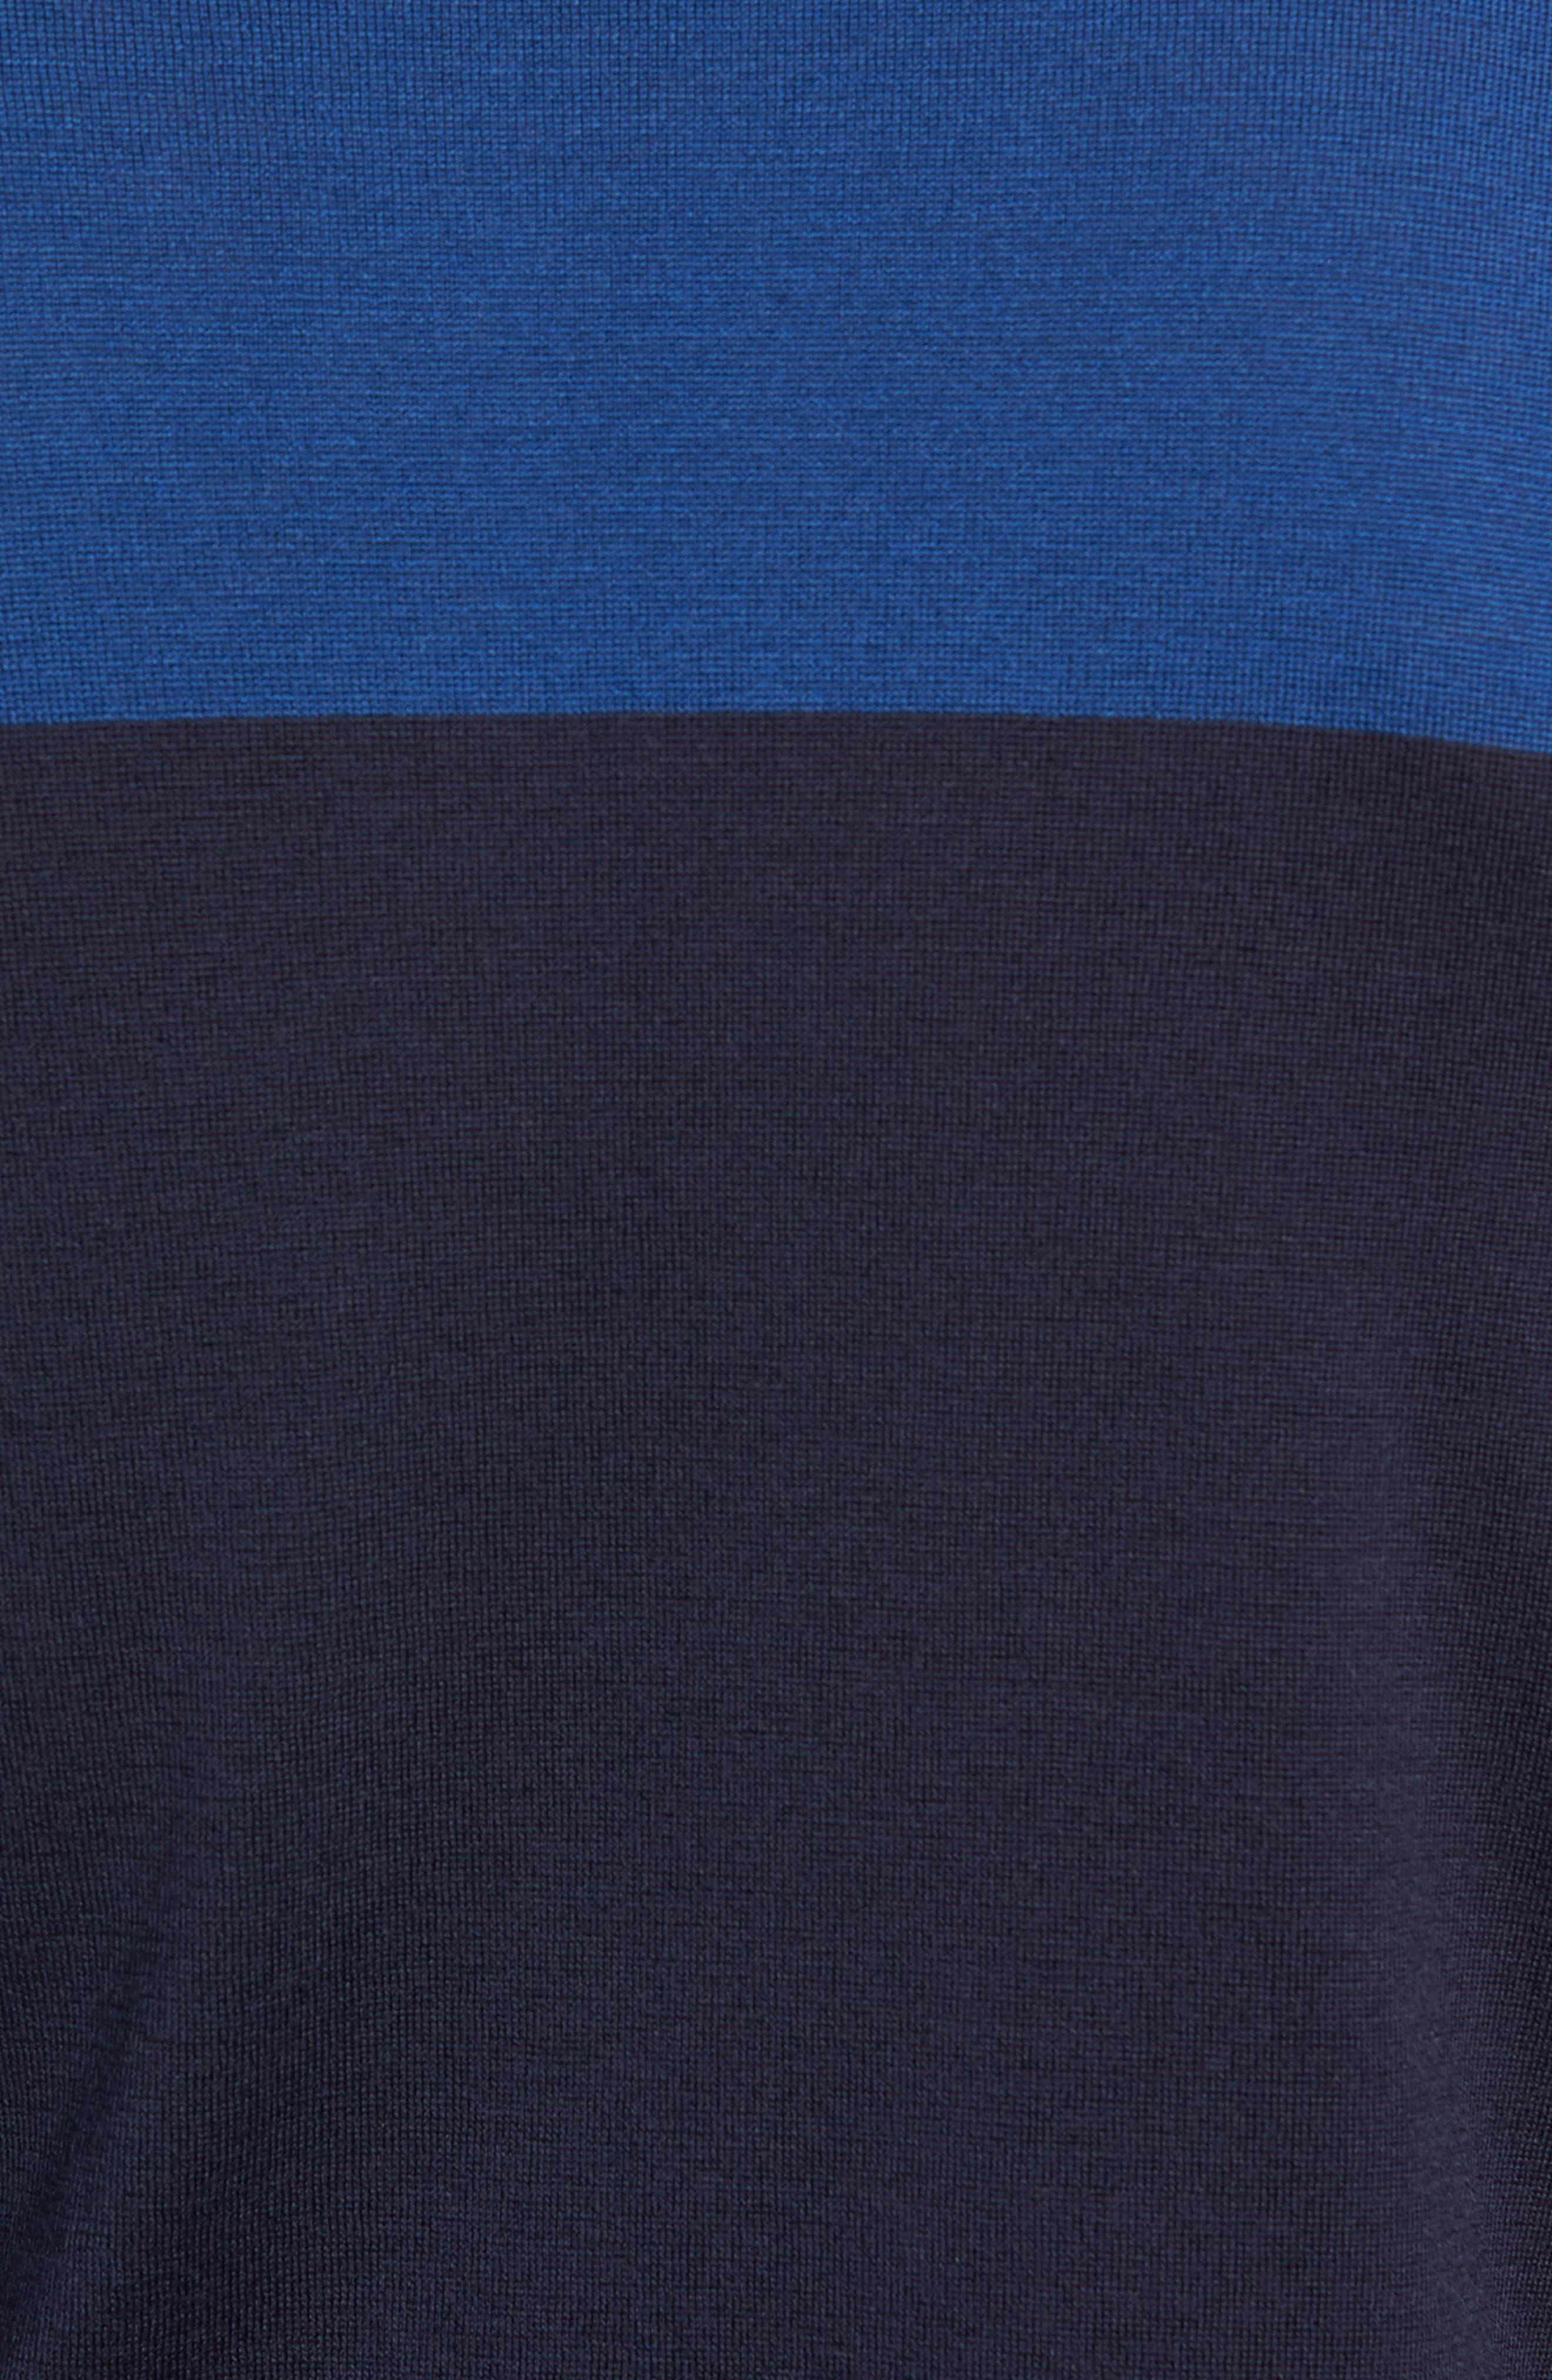 Slim Fit Colorblock Merino Wool Turtleneck Sweater,                             Alternate thumbnail 5, color,                             MIDNIGHT